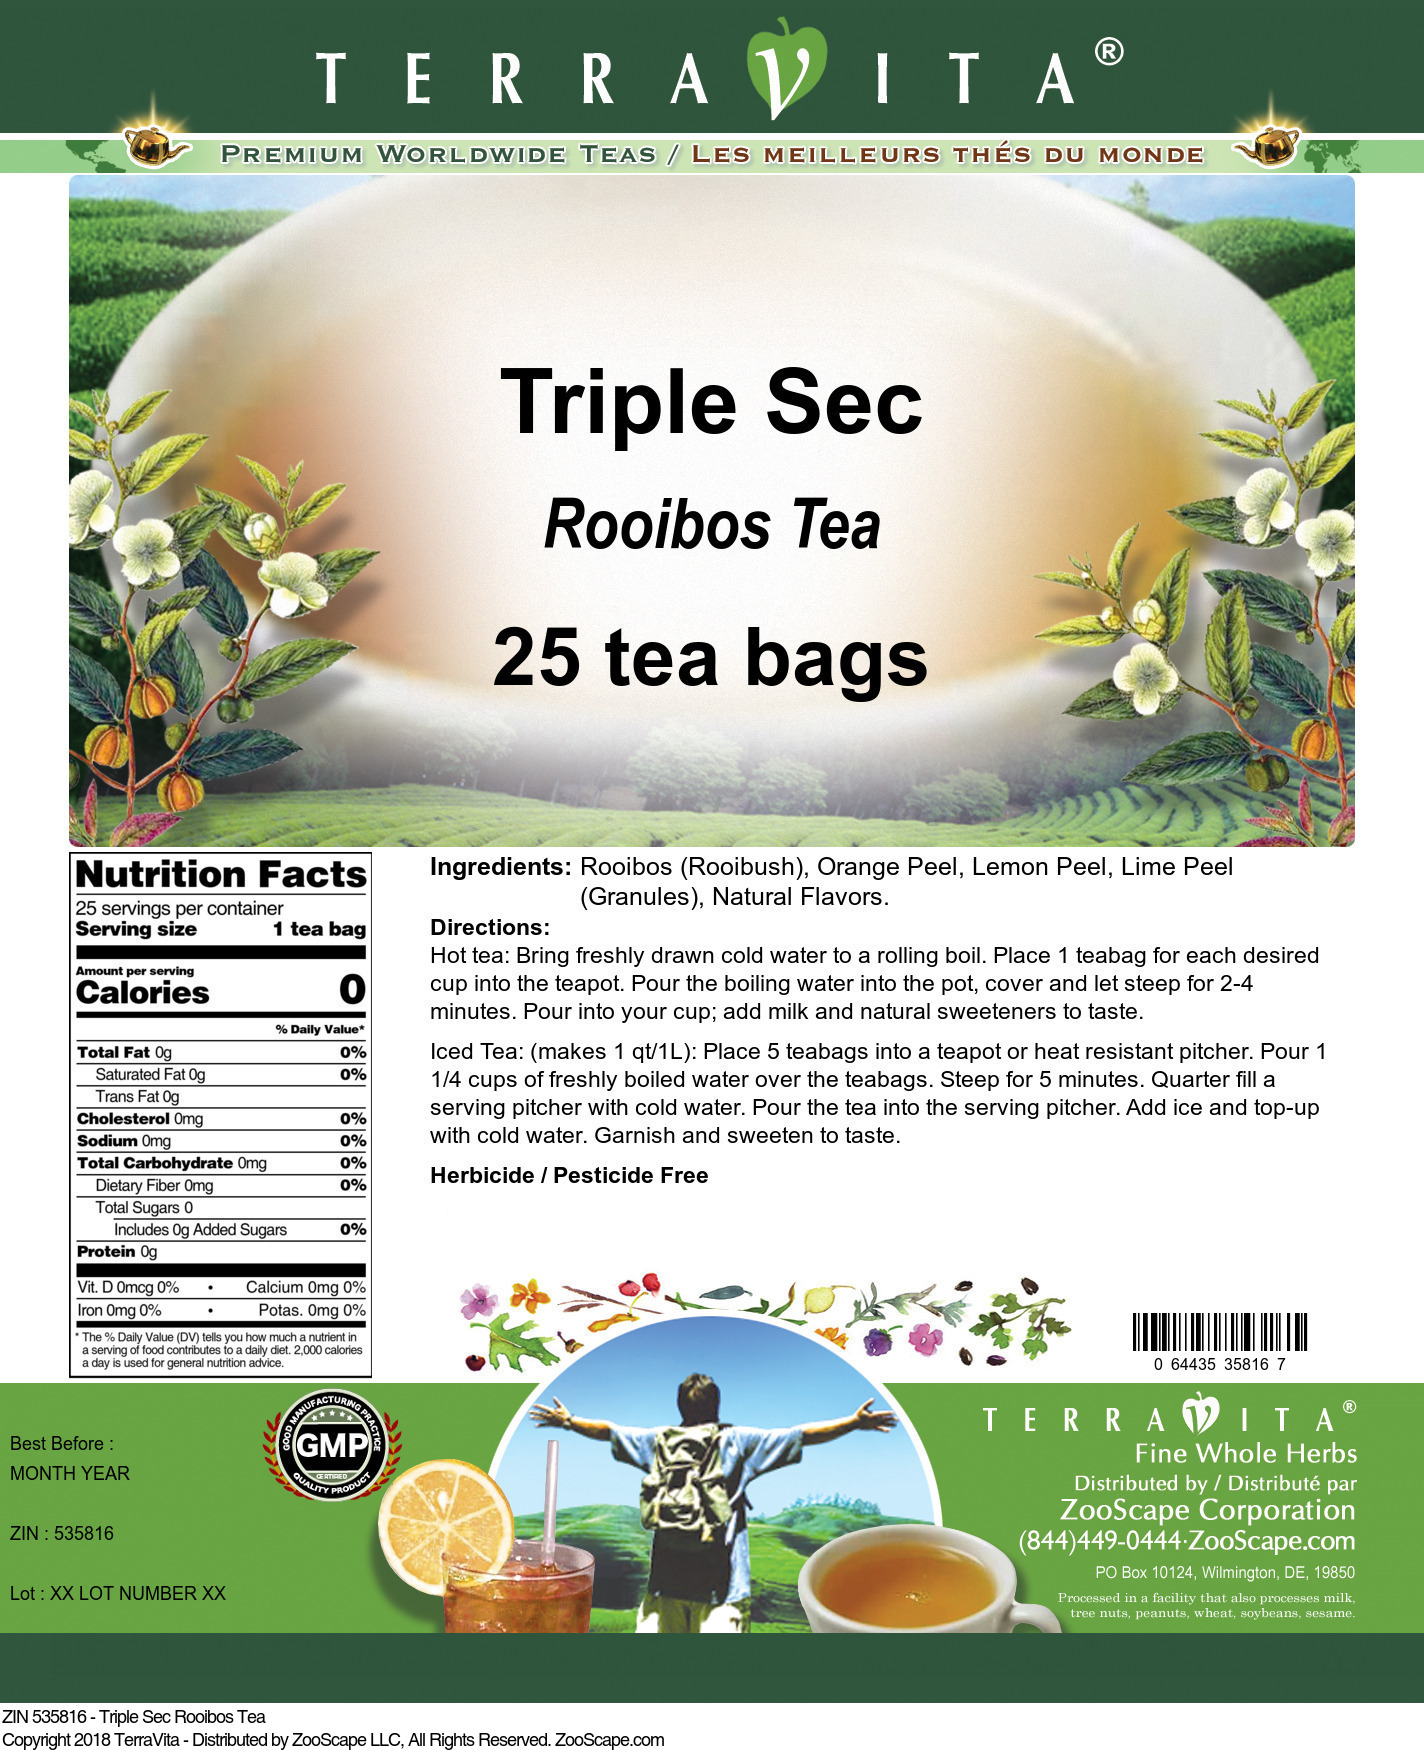 Triple Sec Rooibos Tea